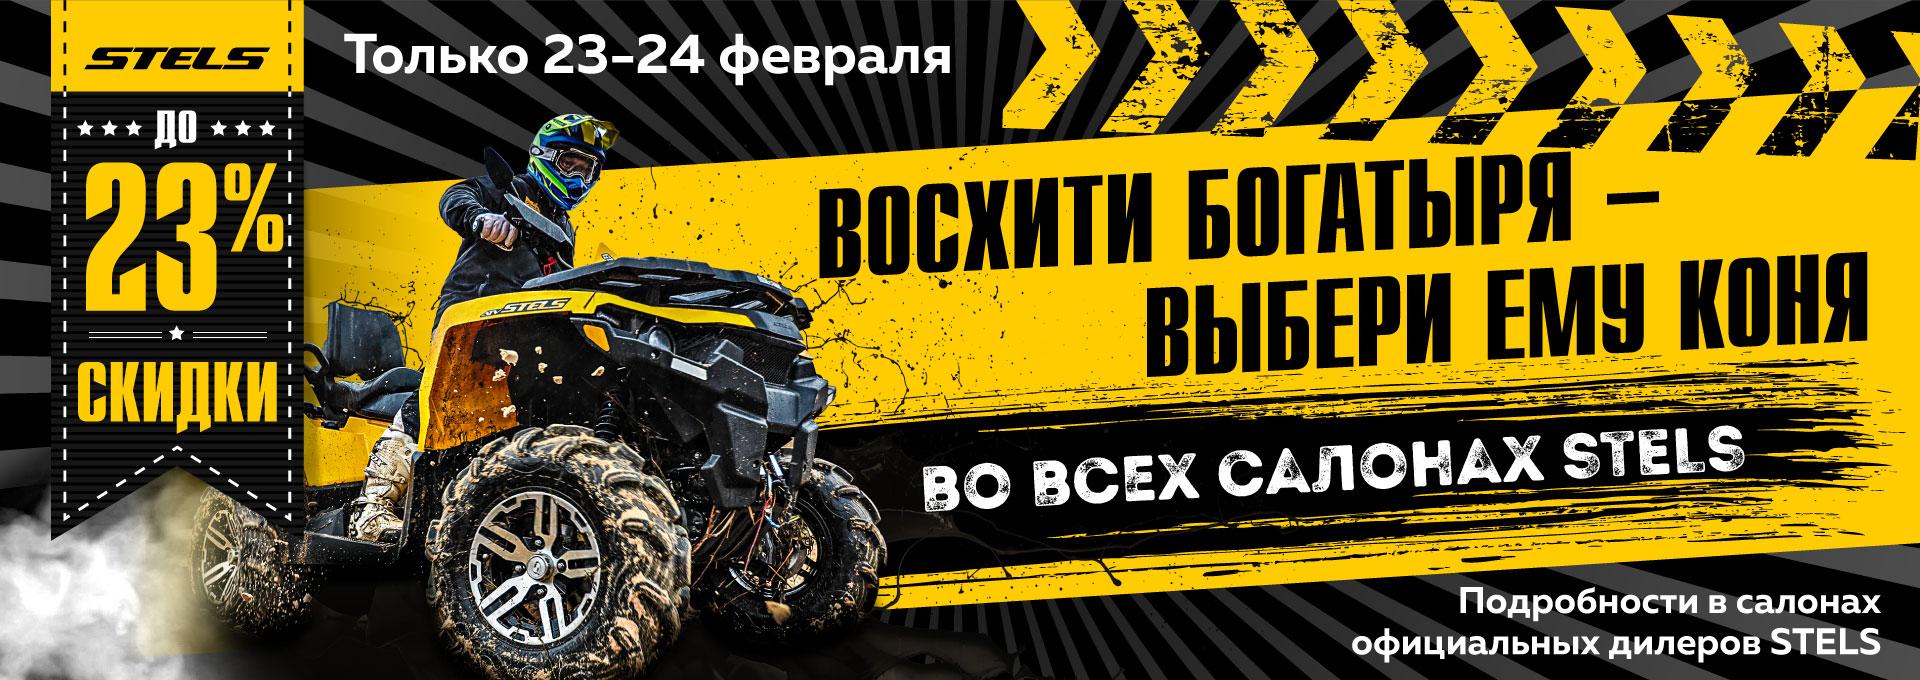 http://www.stels-stavropol.ru/uploads/images/23.02.2019.jpg